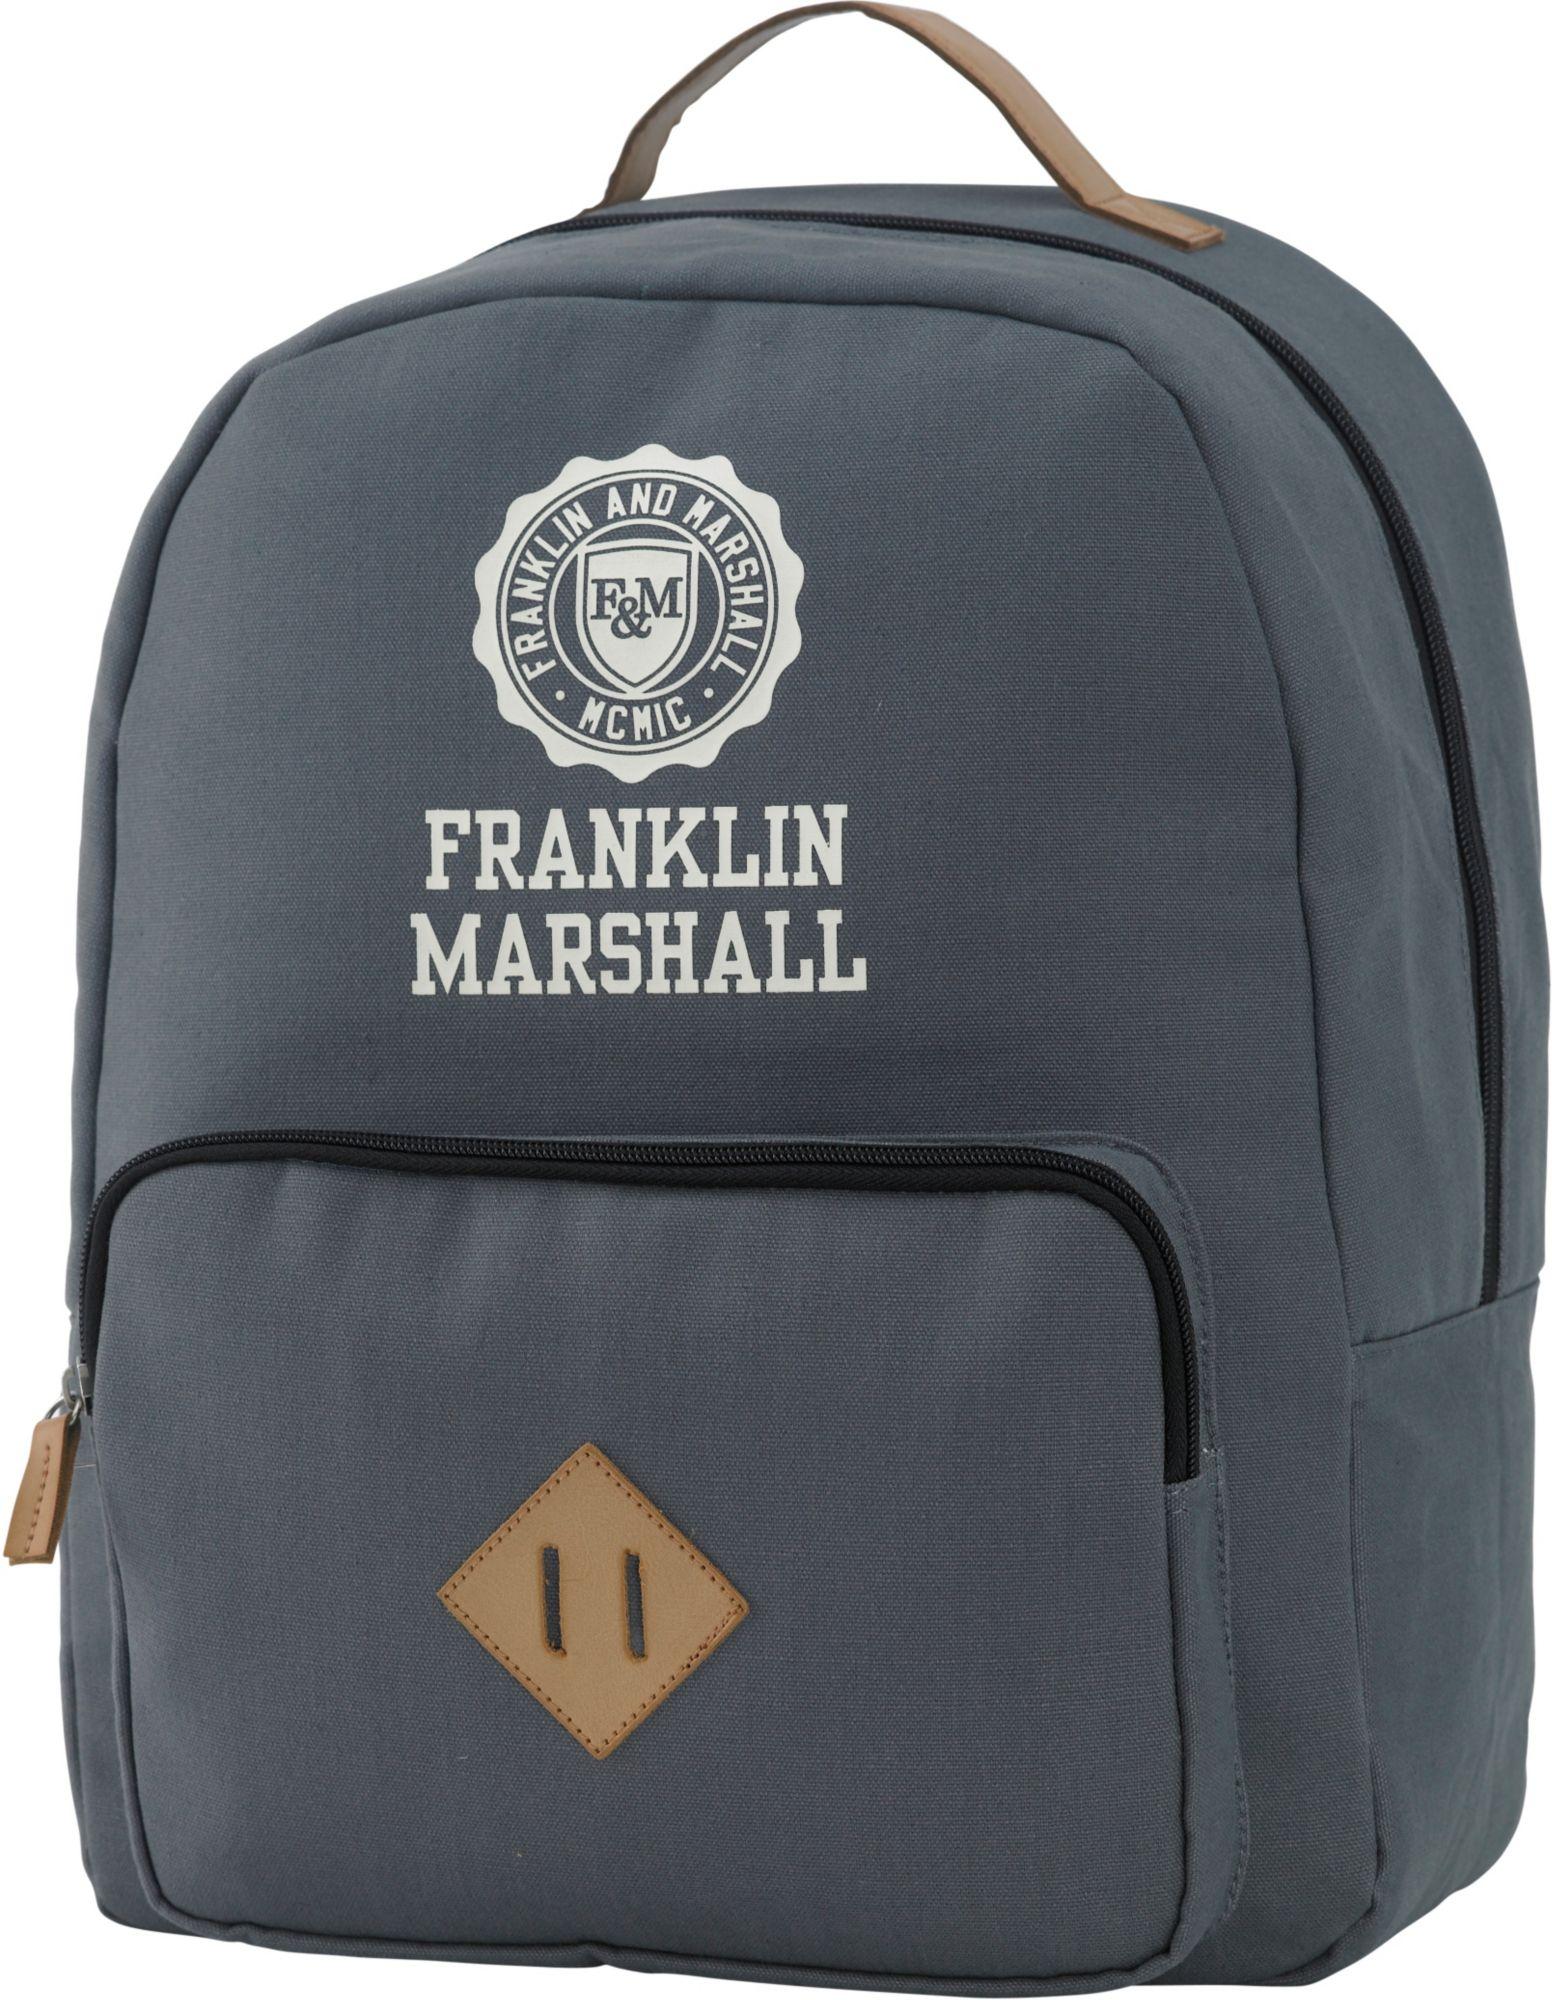 FRANKLIN MARSHALL Franklin & Marshall, Rucksack mit gepolstertem Laptopfach, »Boys Backpack, grau«